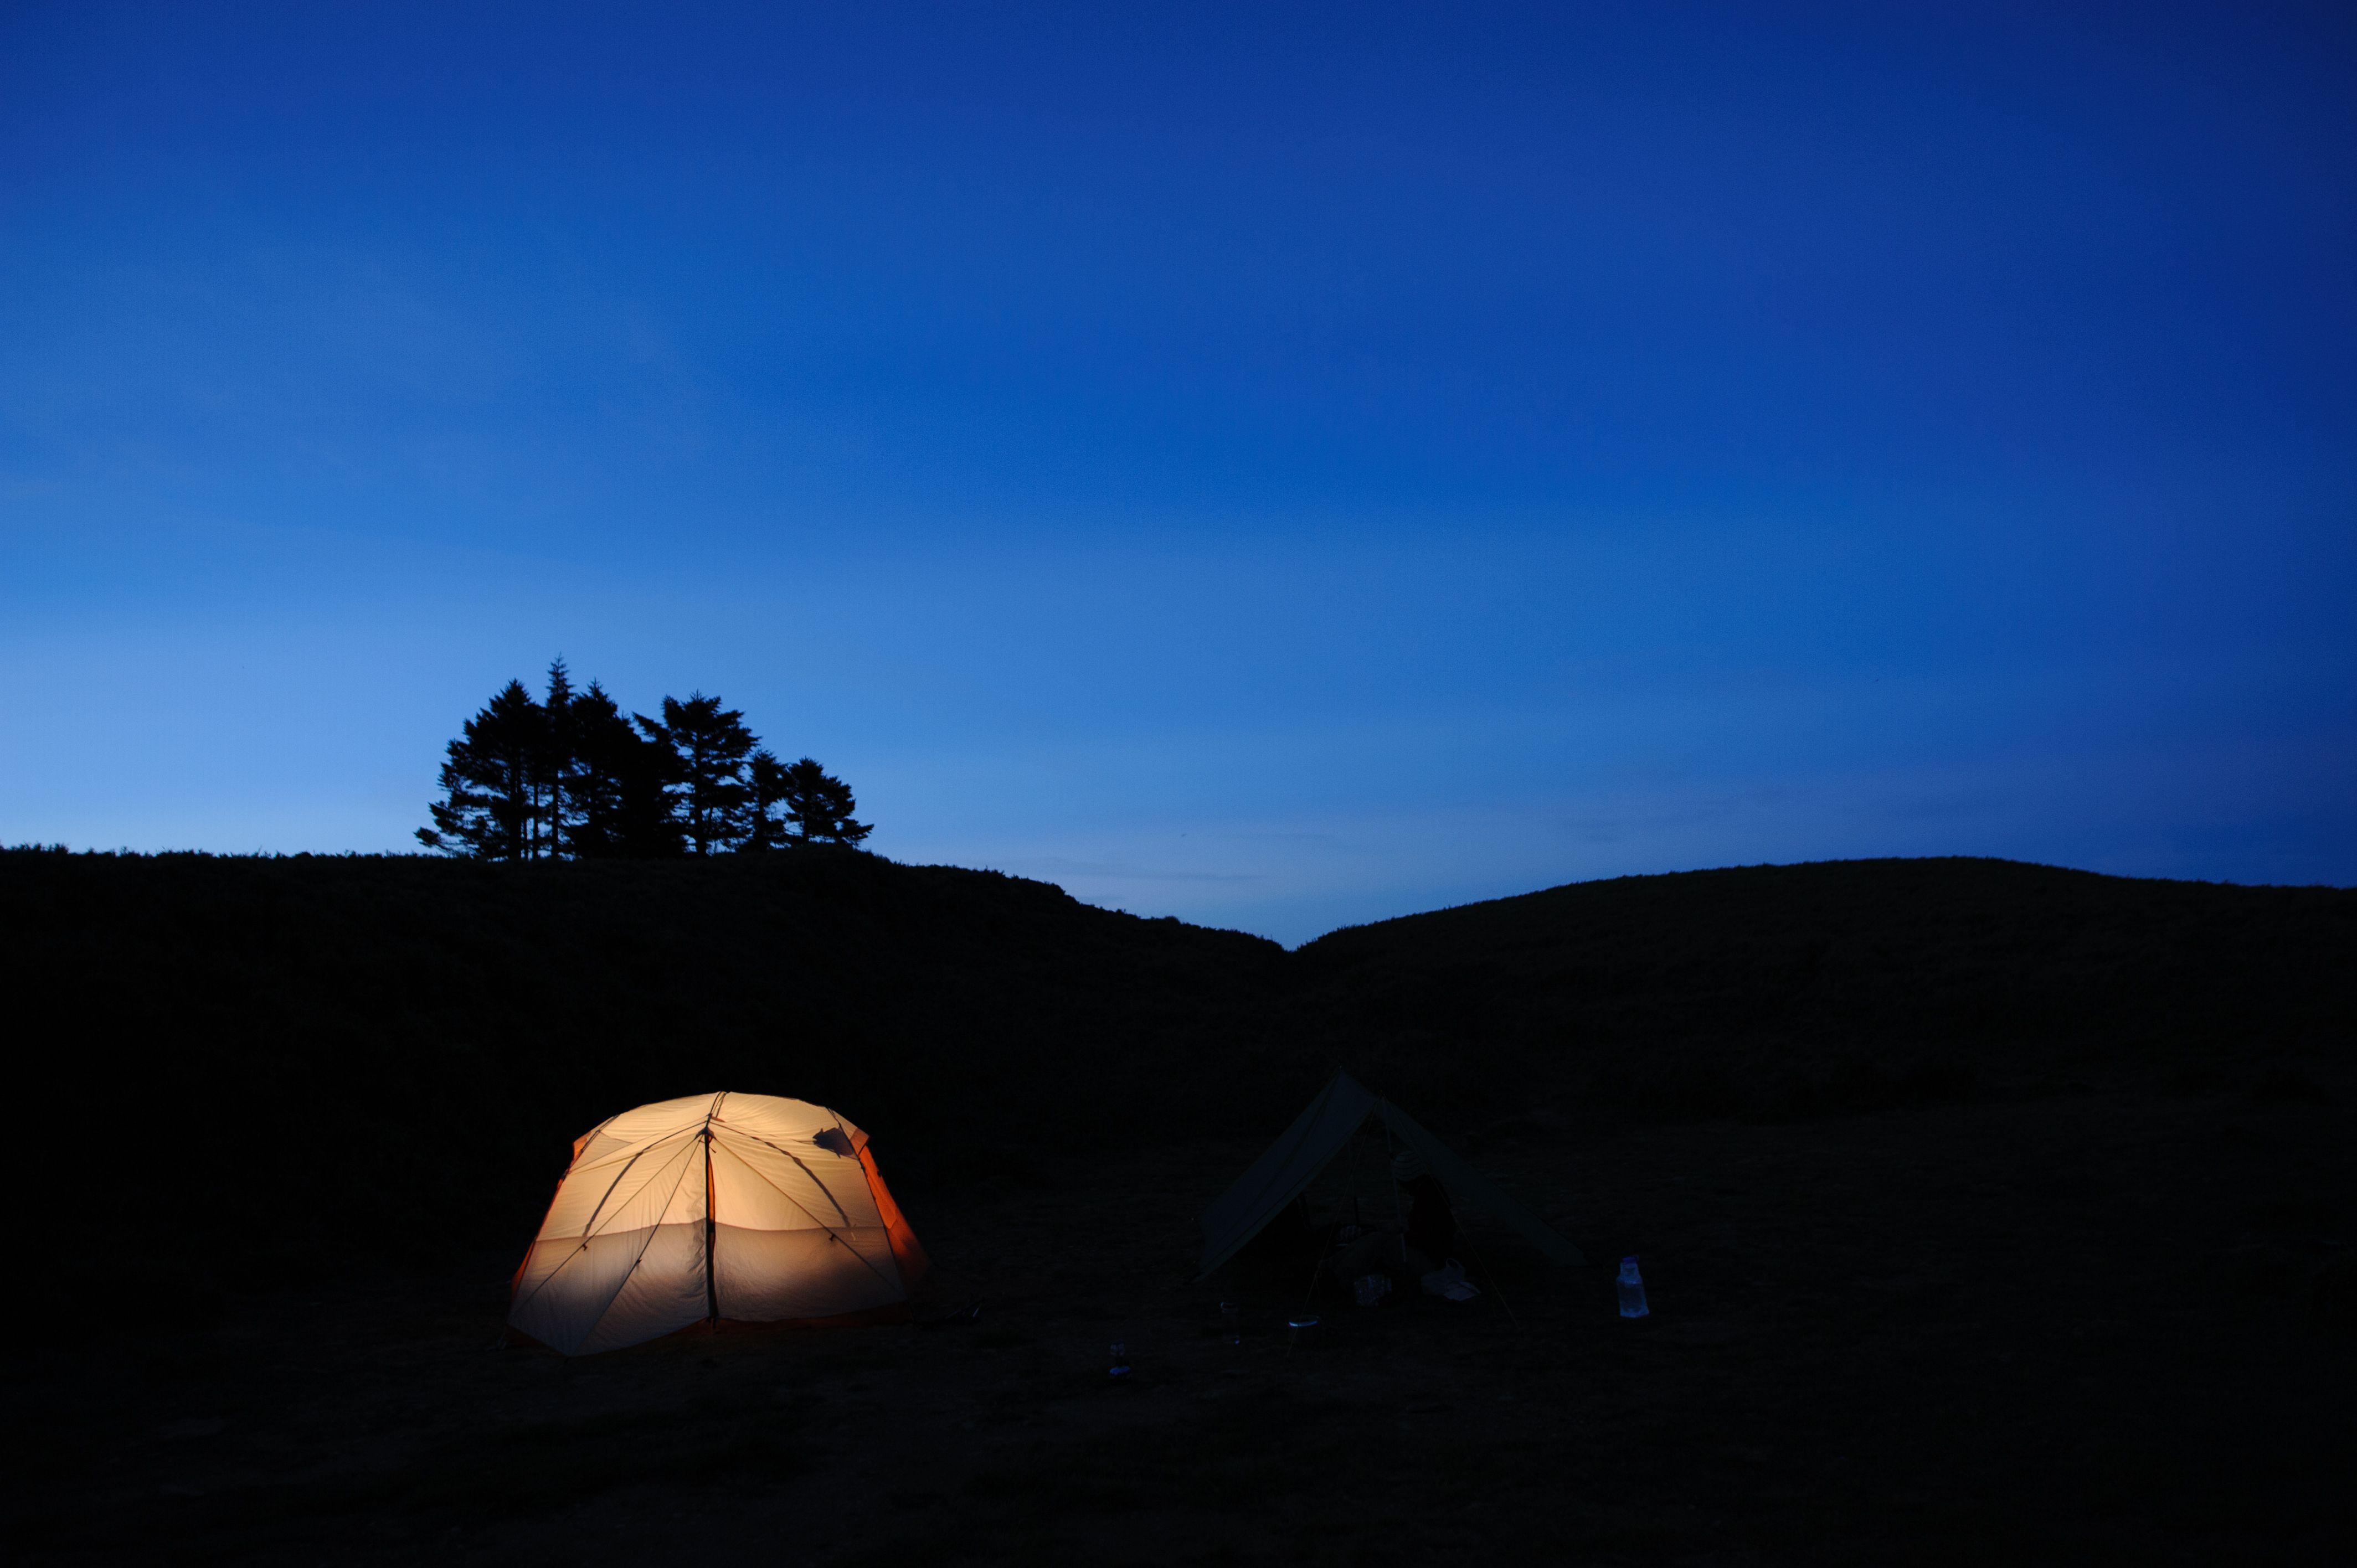 Wild Camp Camping Wild Camp Camping Photography Camping